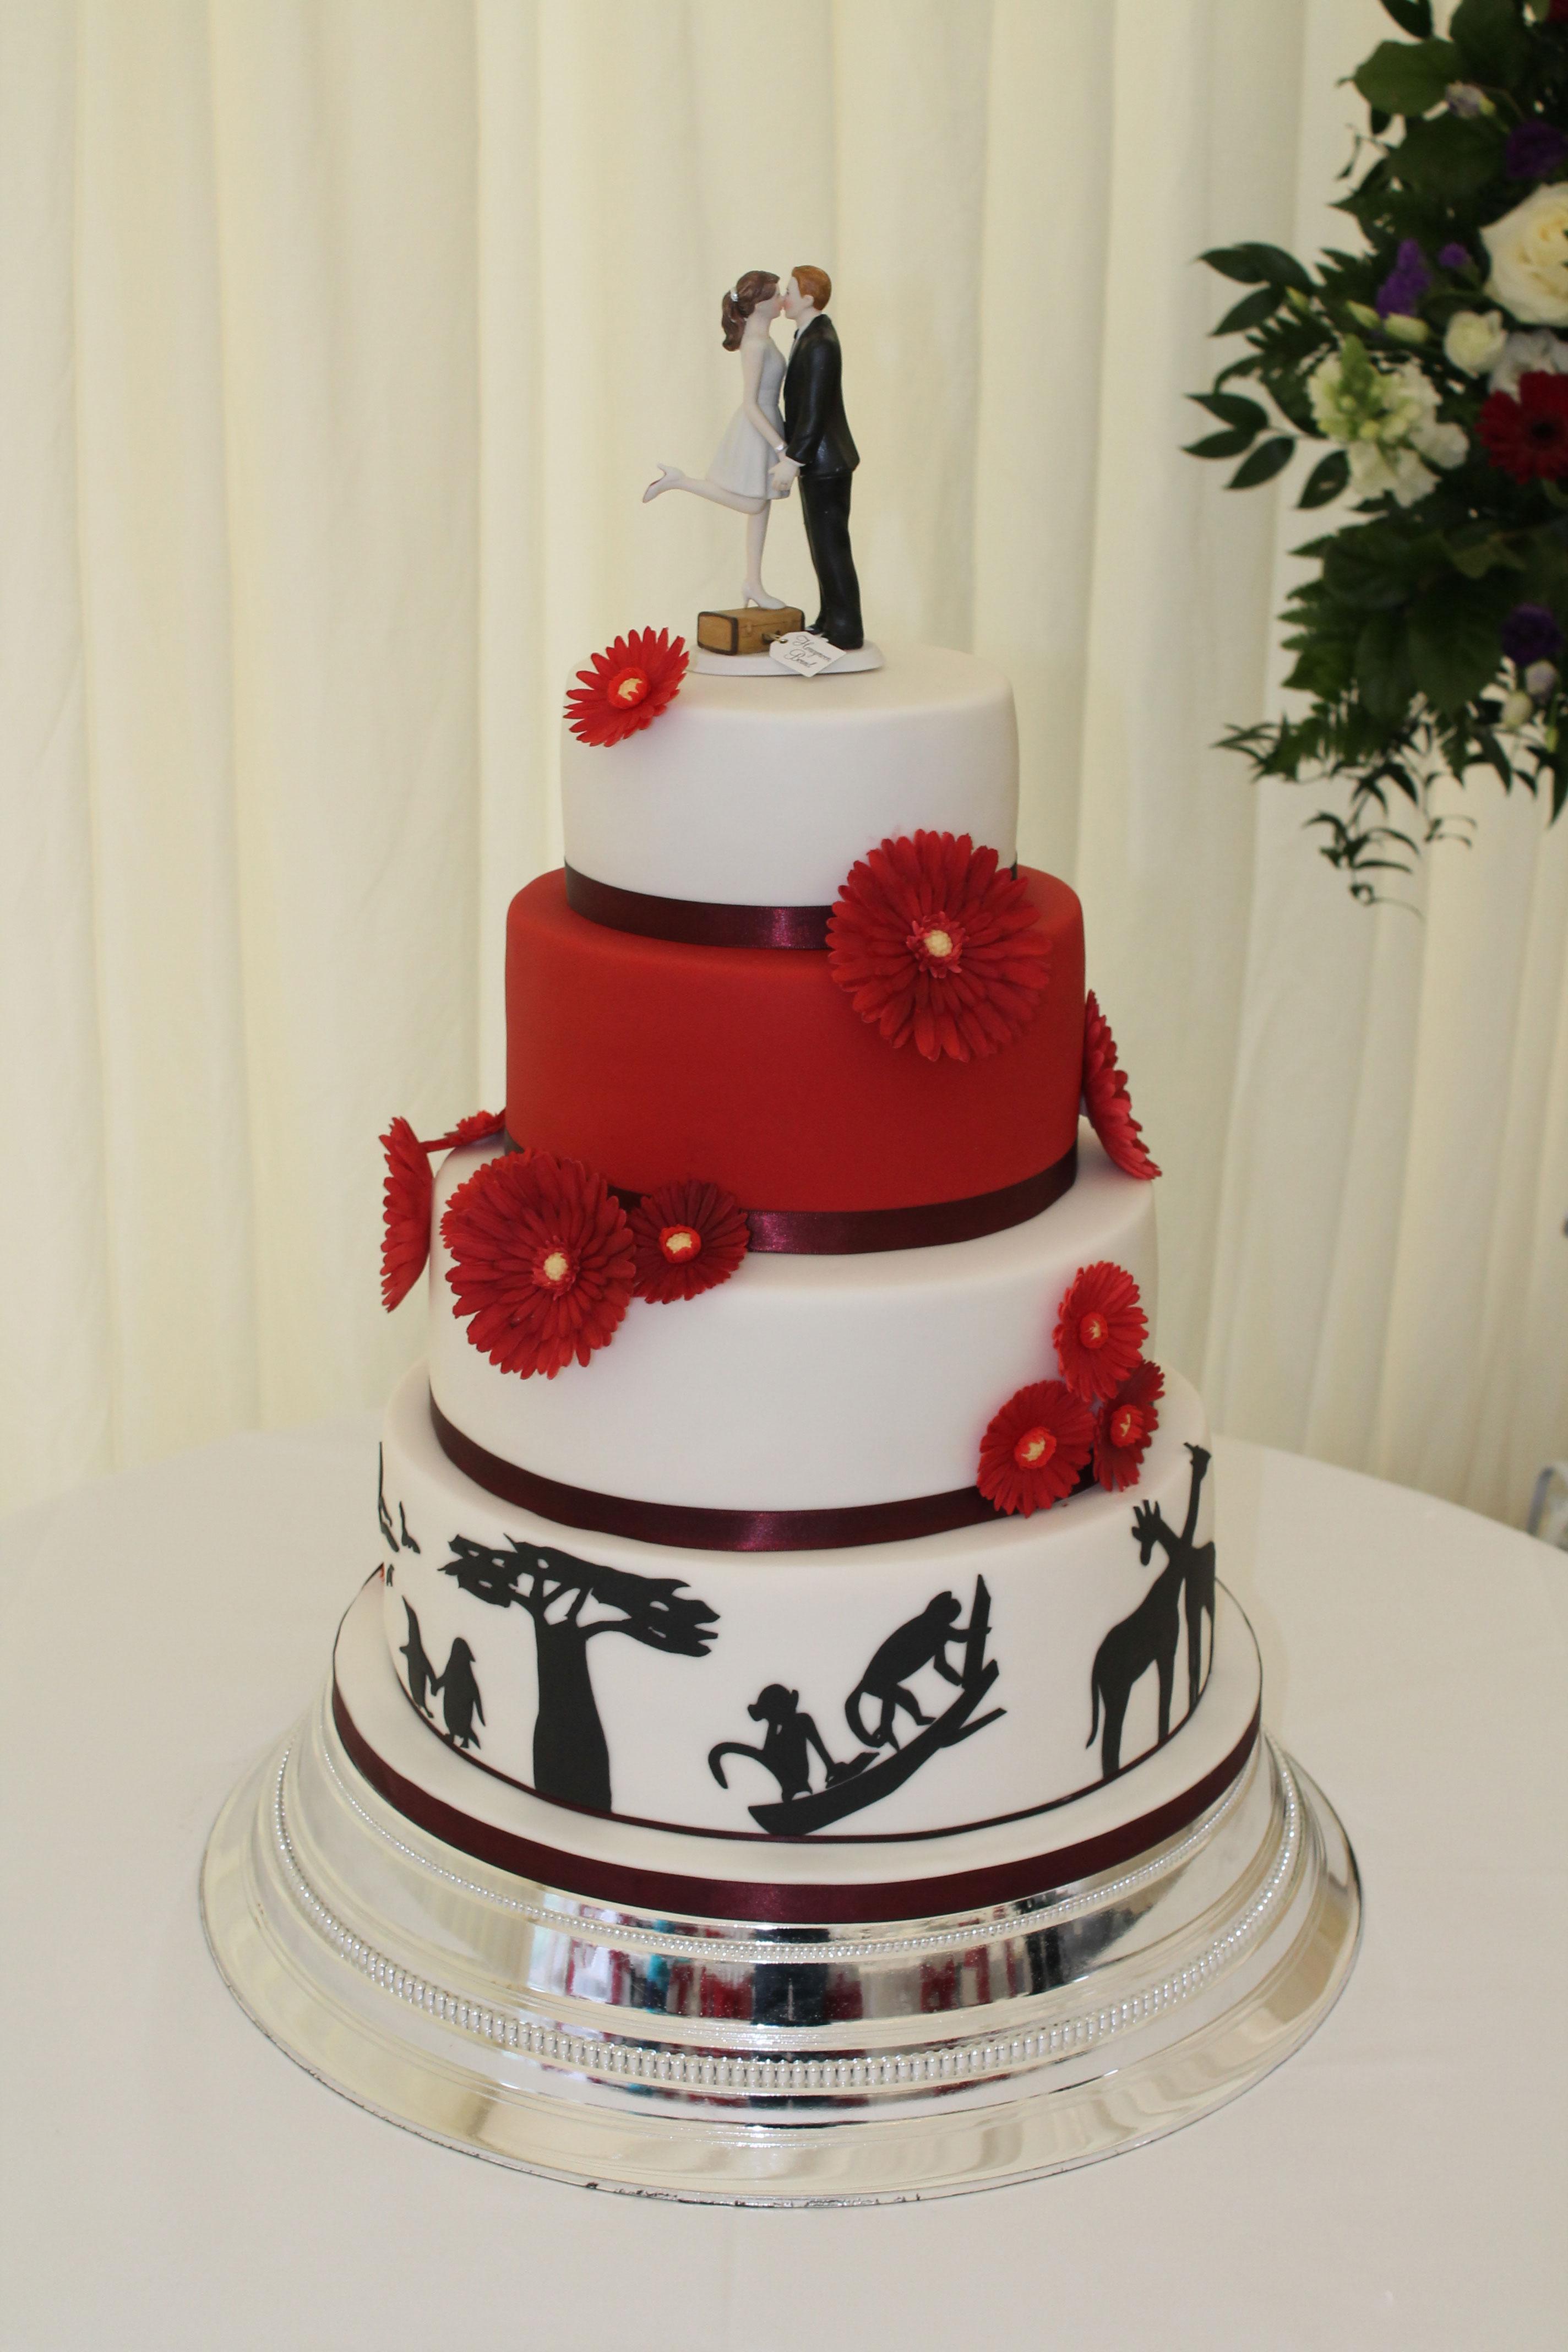 Marwell Zoo Cake